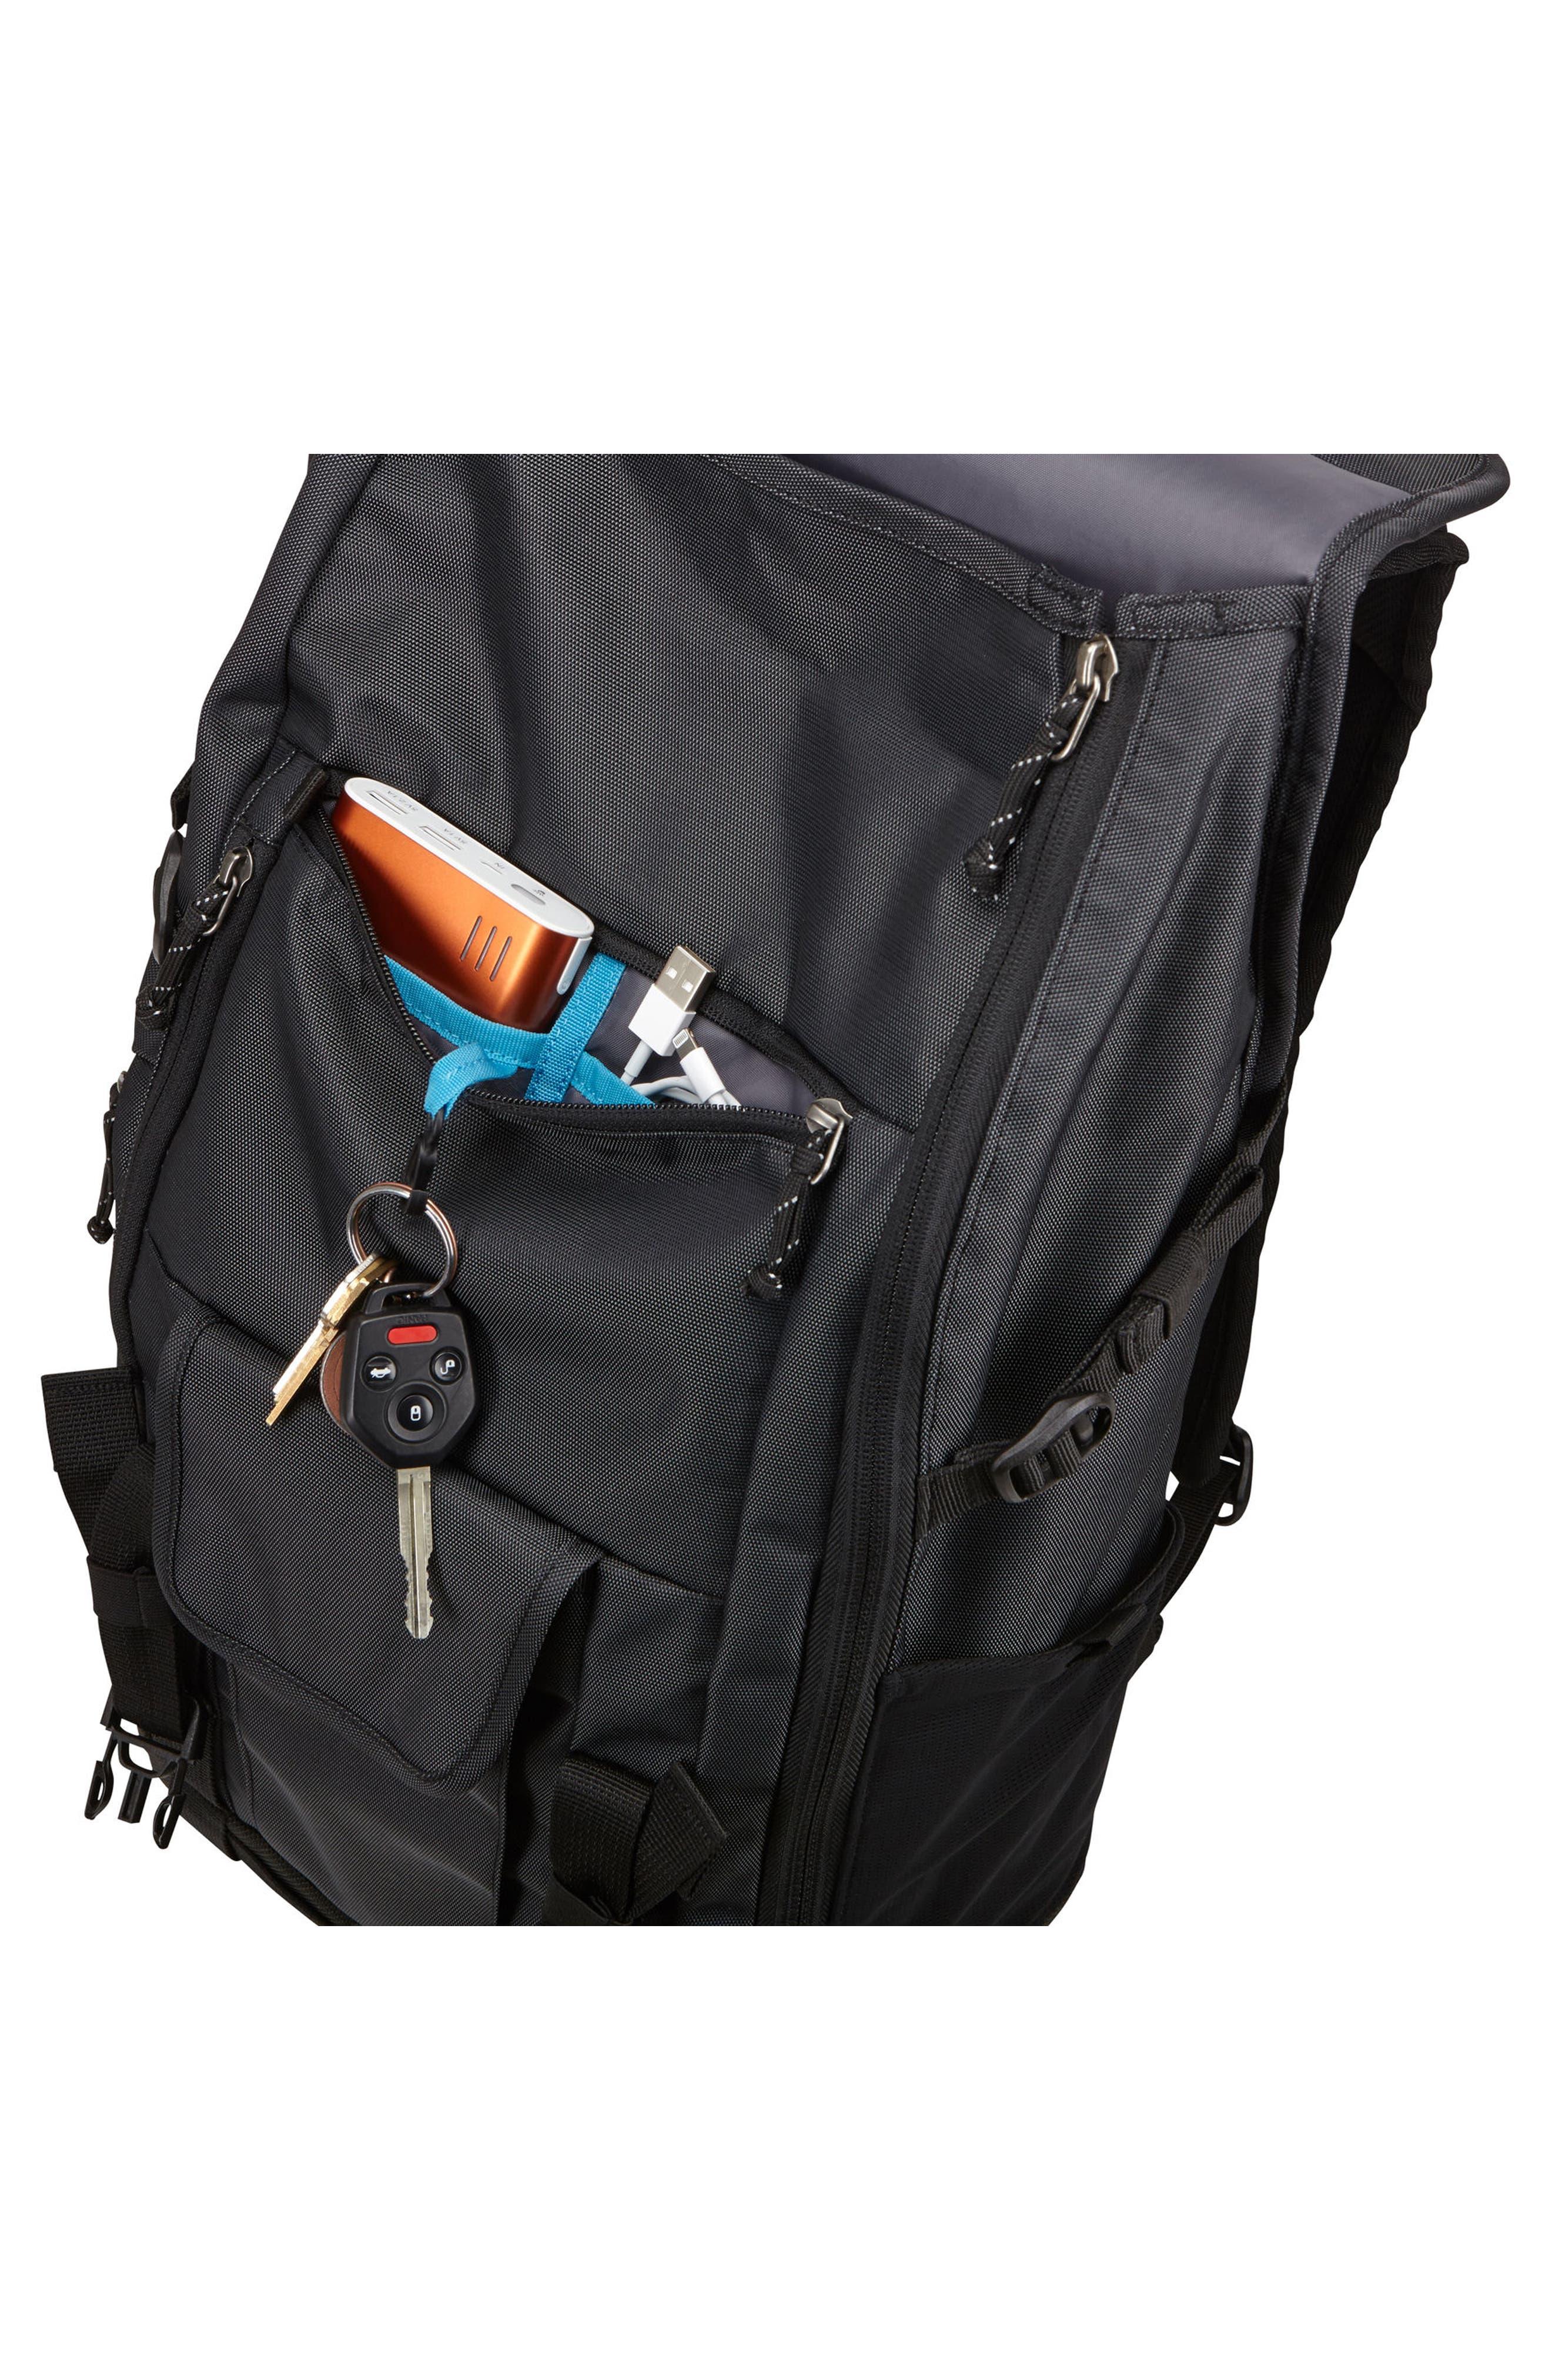 Subterra 34-Liter Backpack,                             Alternate thumbnail 7, color,                             021